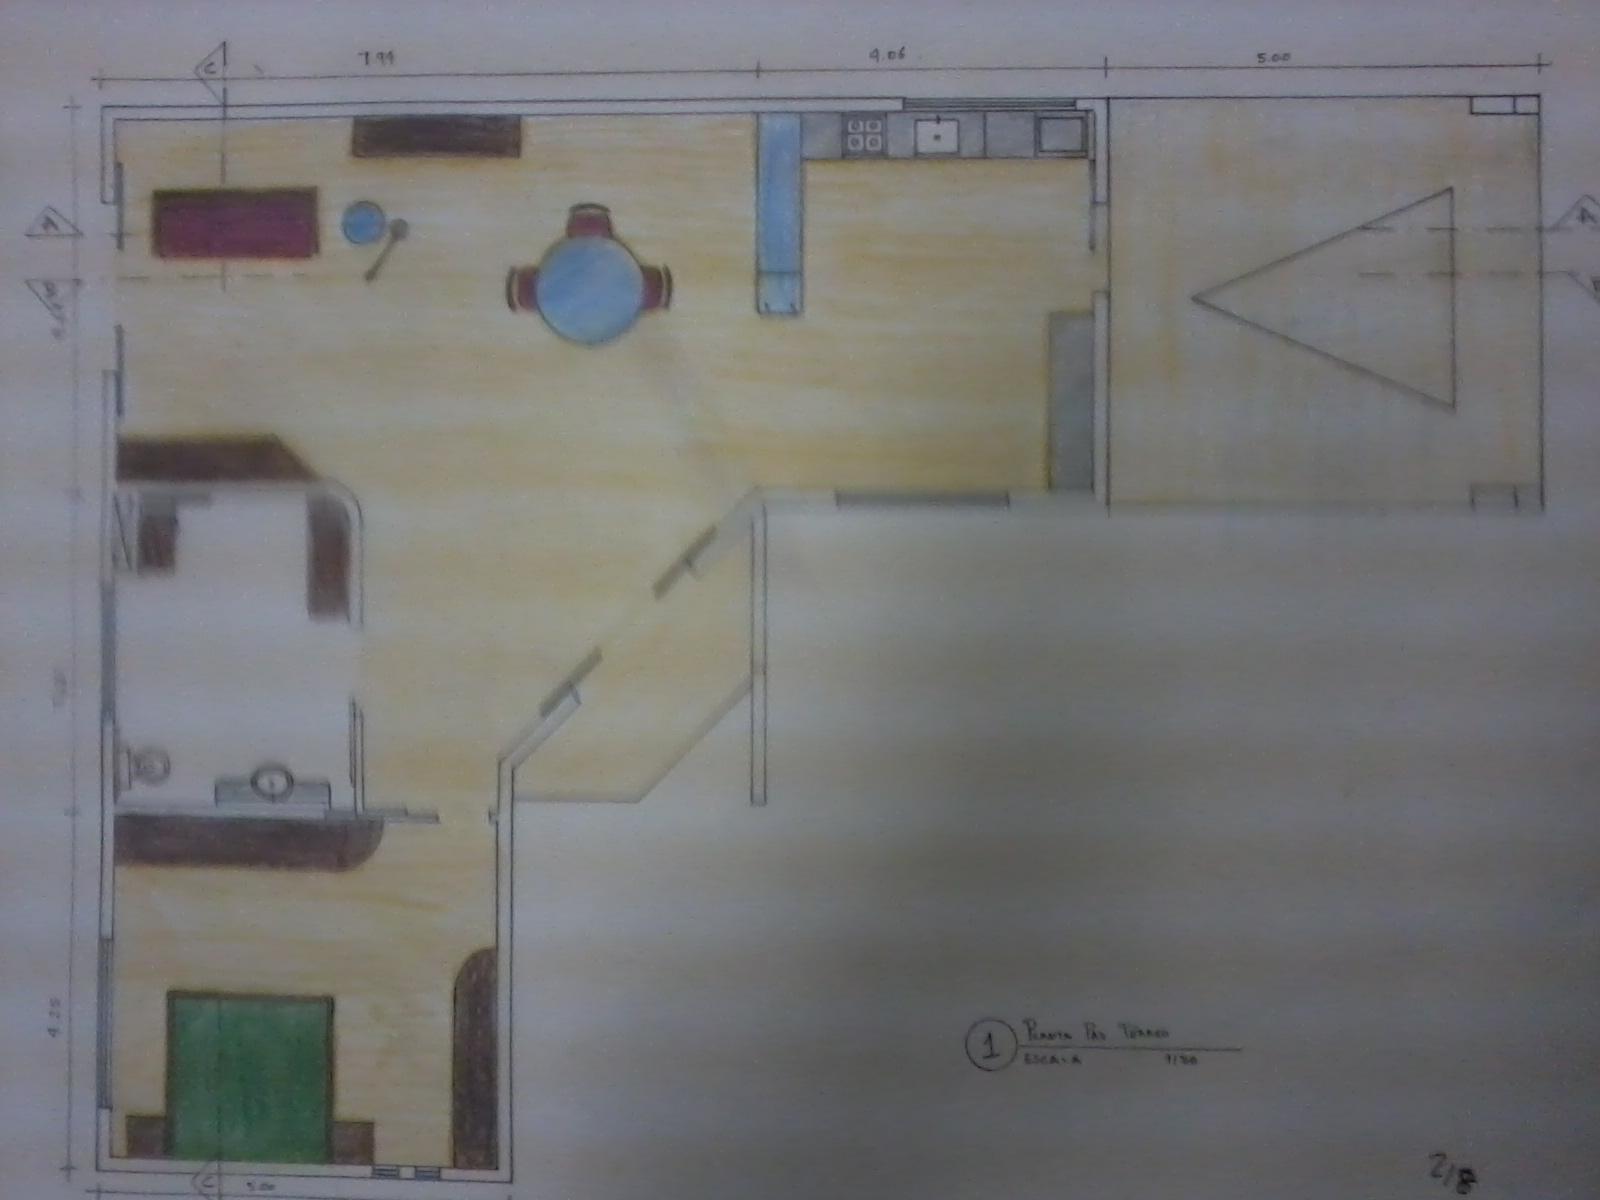 Planta baixa do térreo #59464C 1600x1200 Banheiro Acessivel Planta Baixa